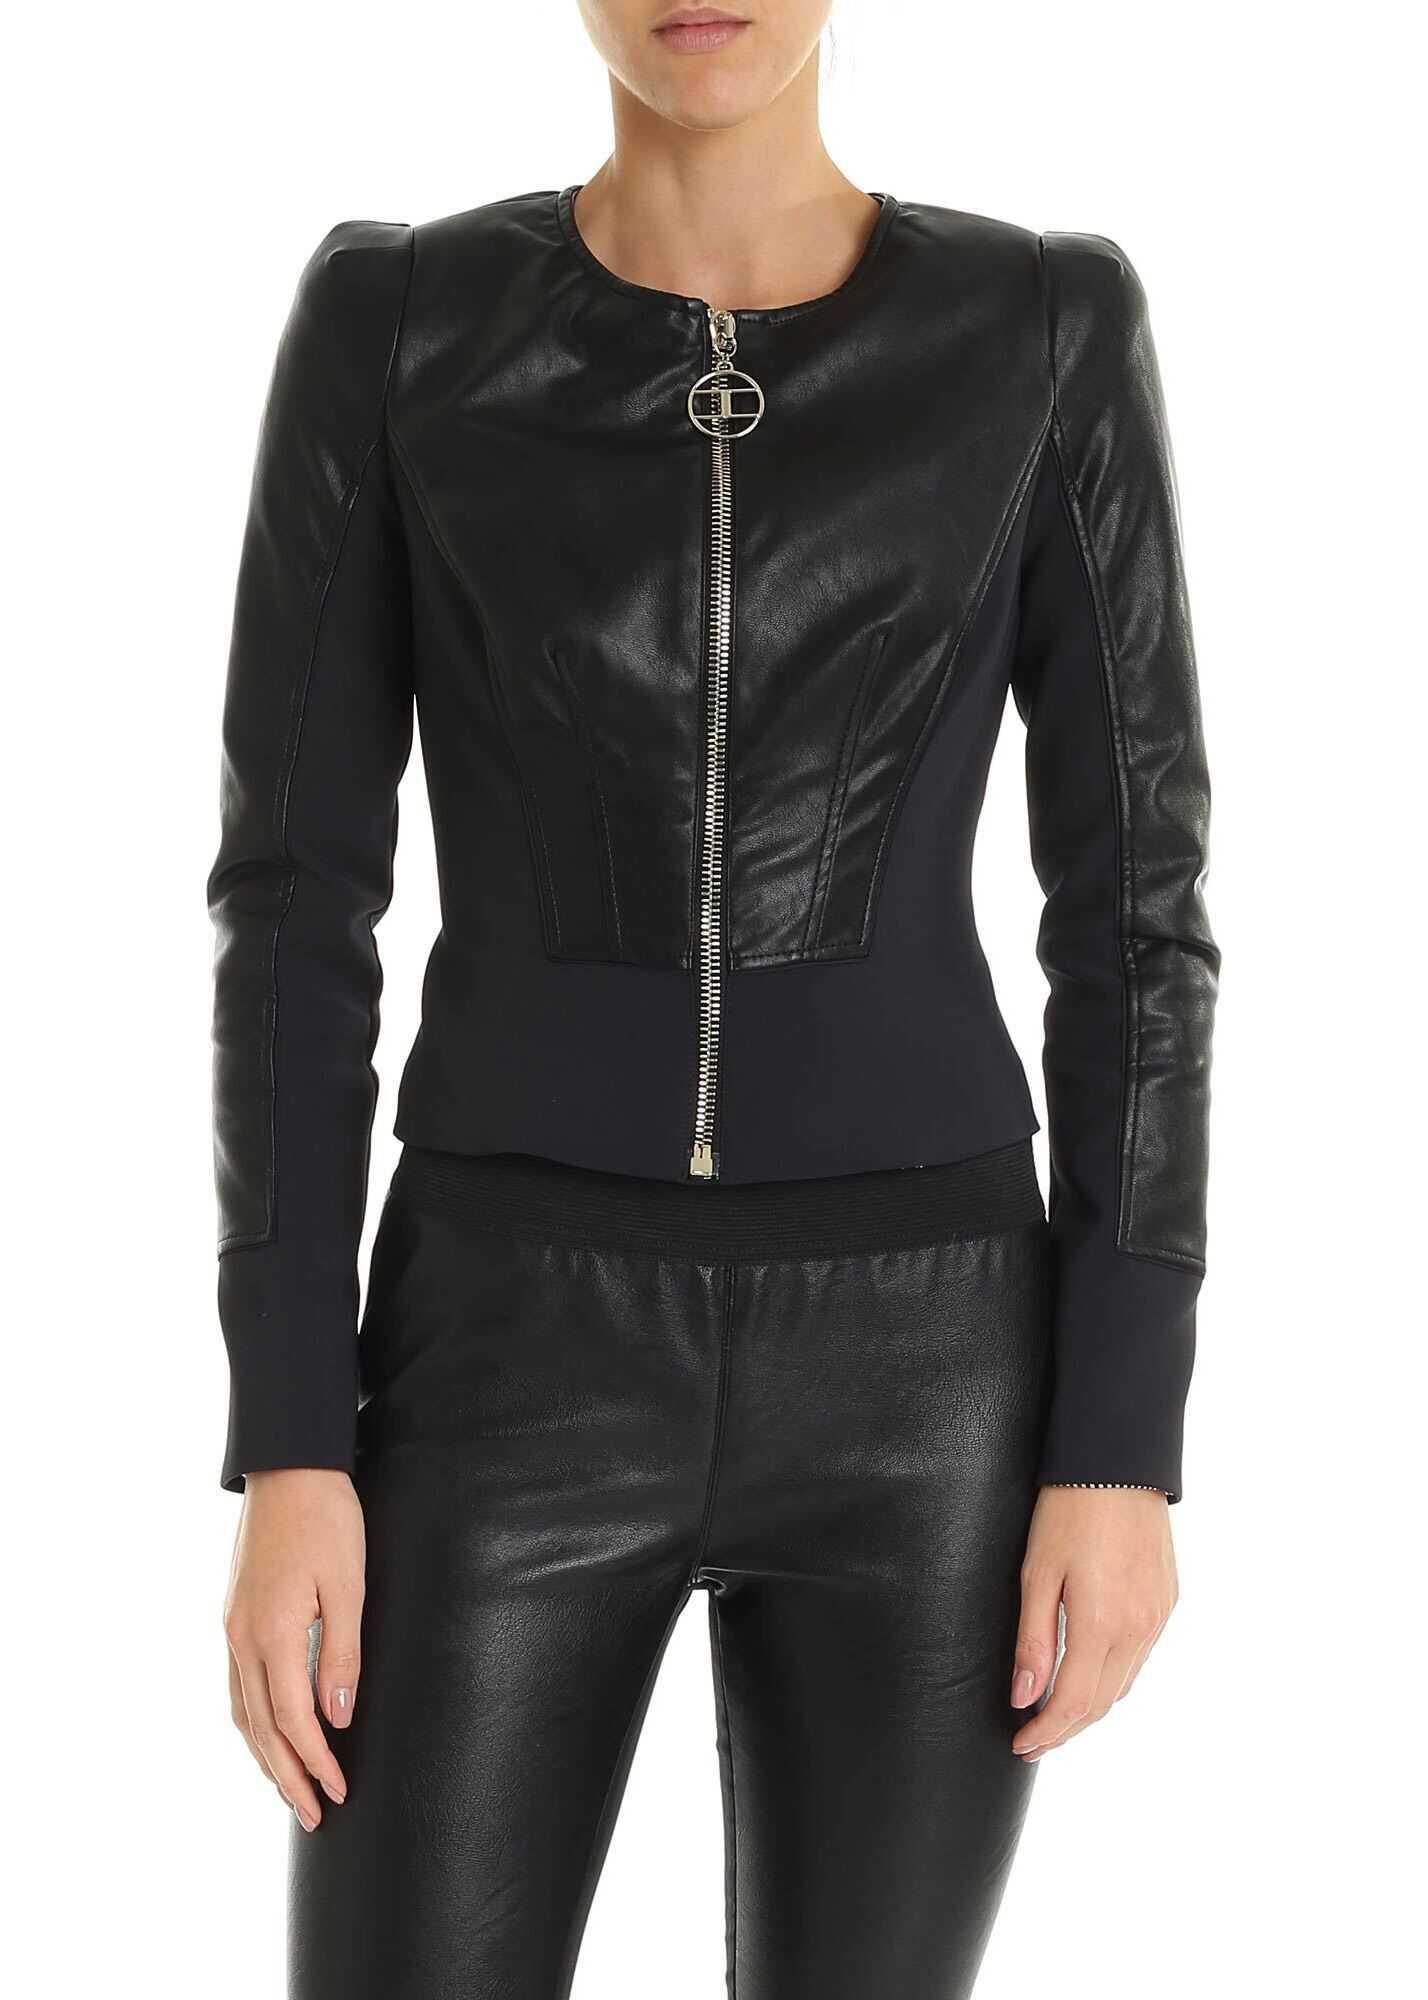 Elisabetta Franchi Black Short Jacket Black